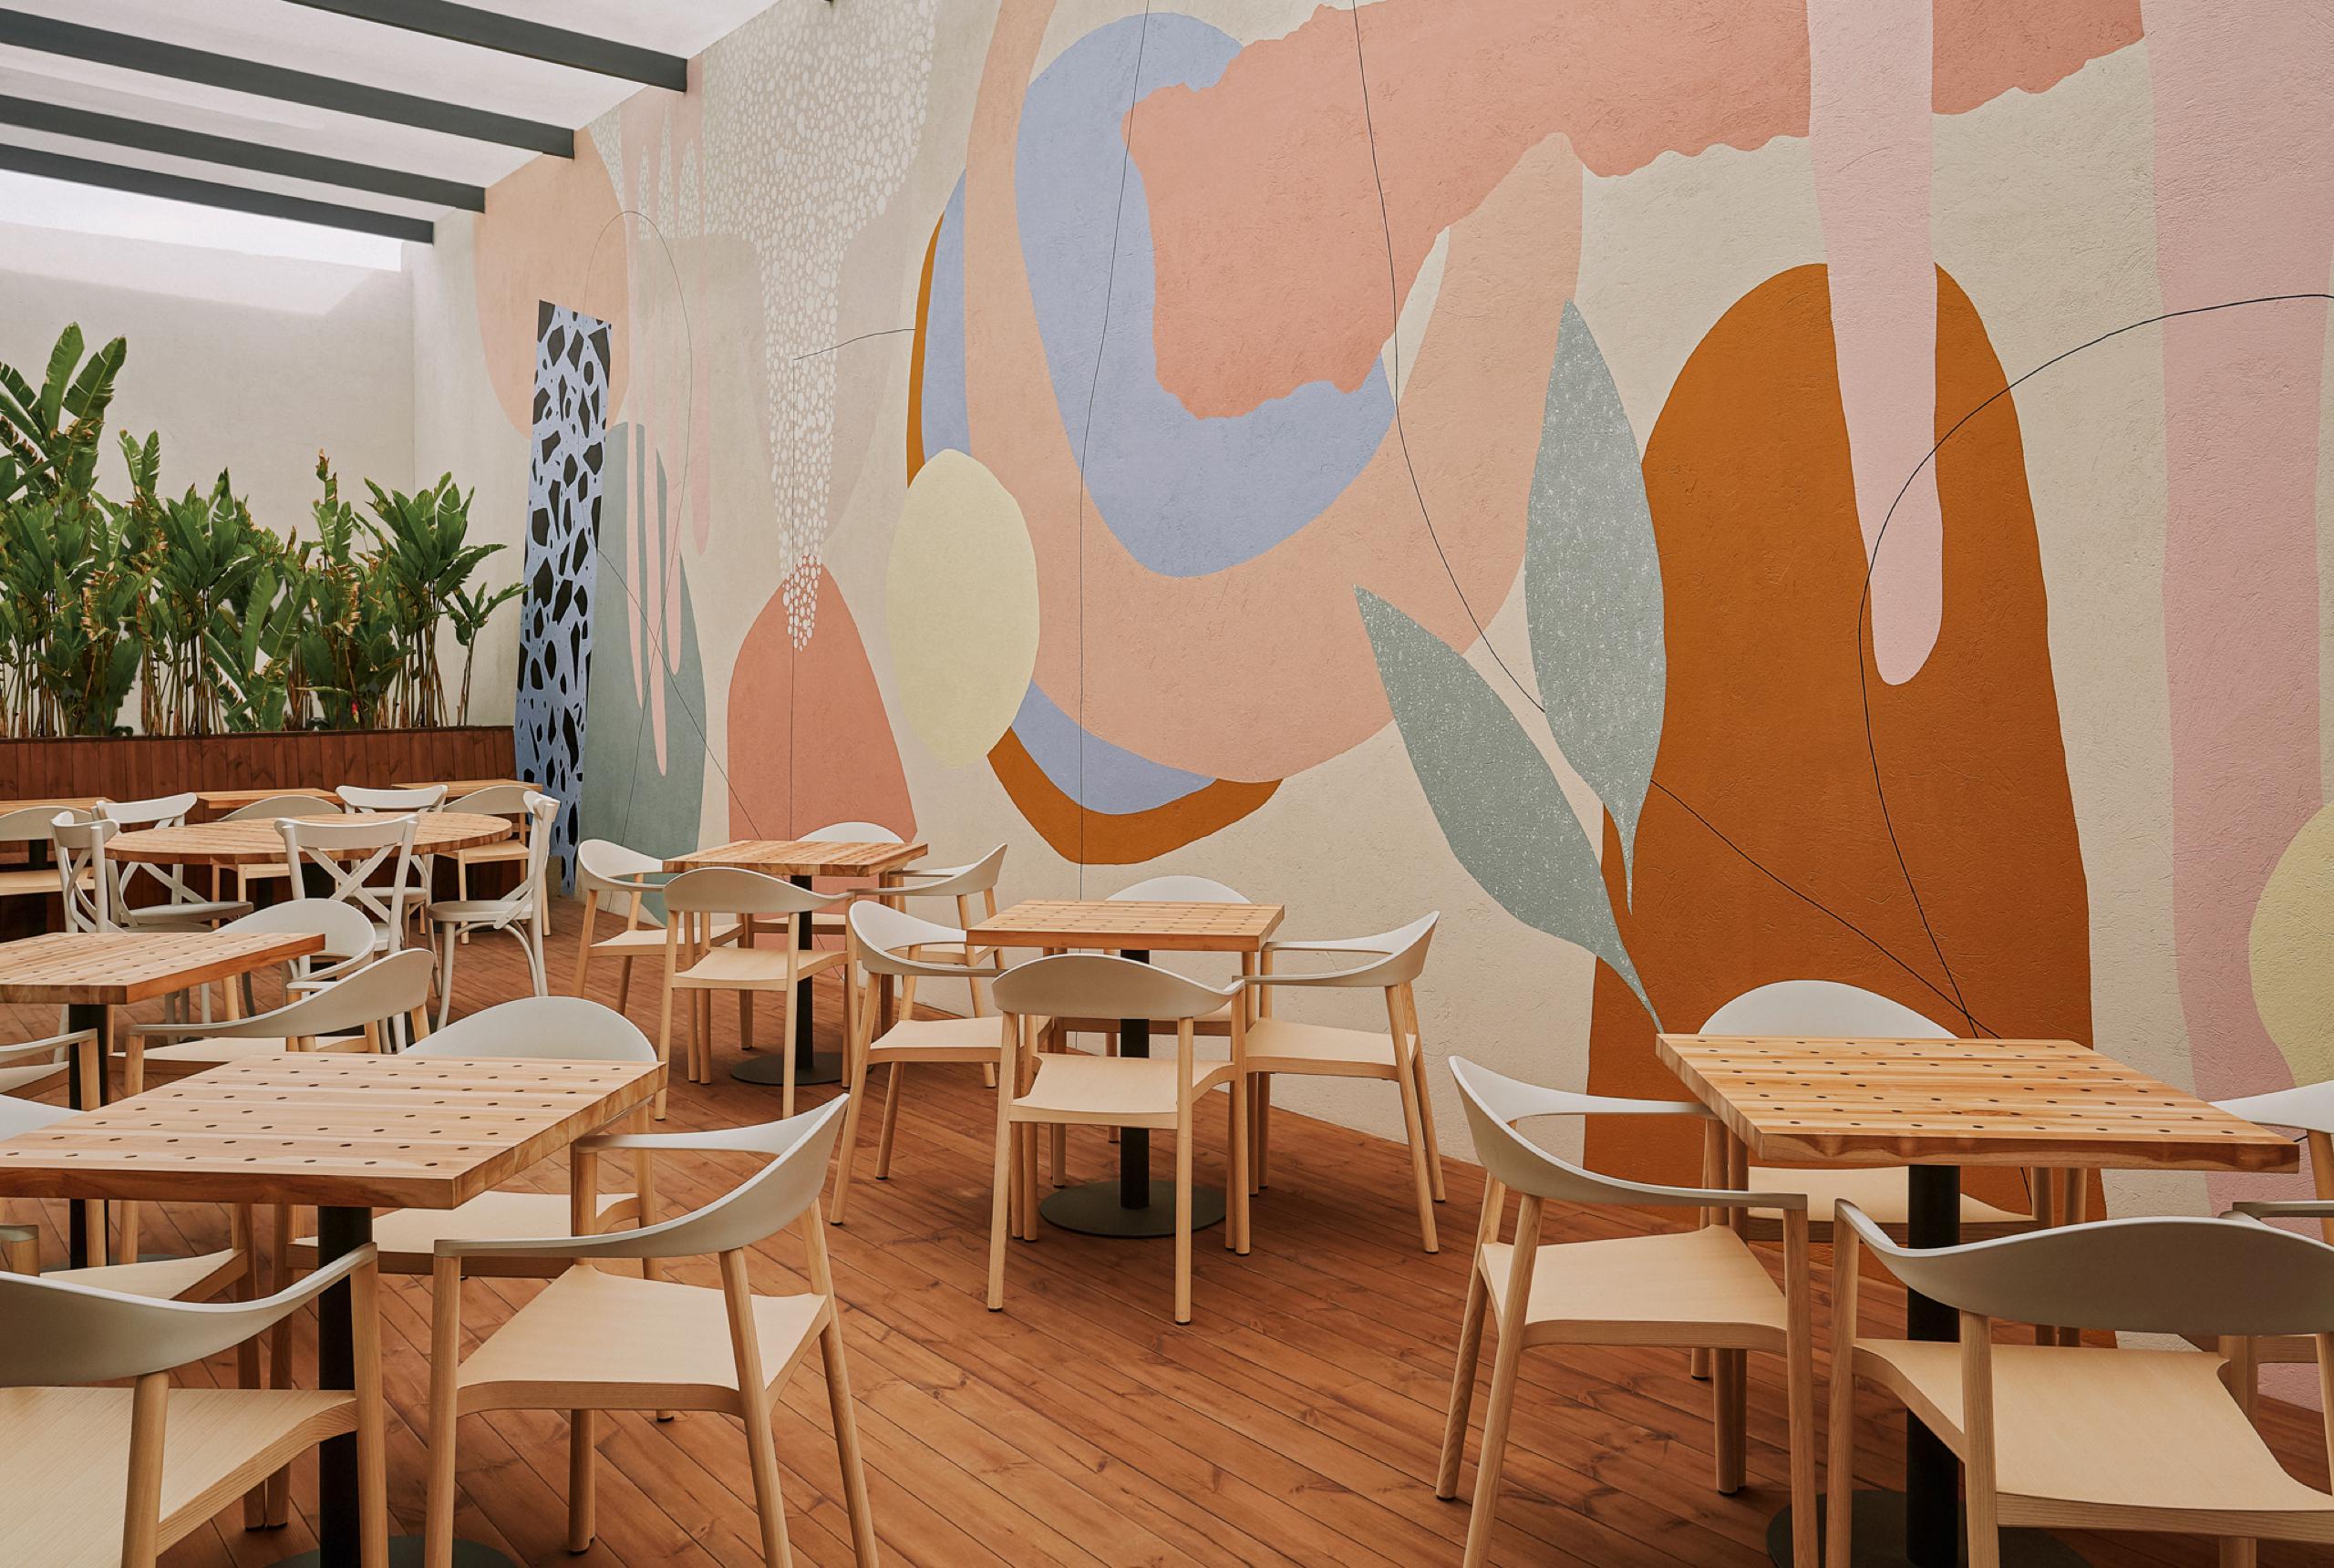 alexproba_designerin-decohomde-wallmural-restaurant